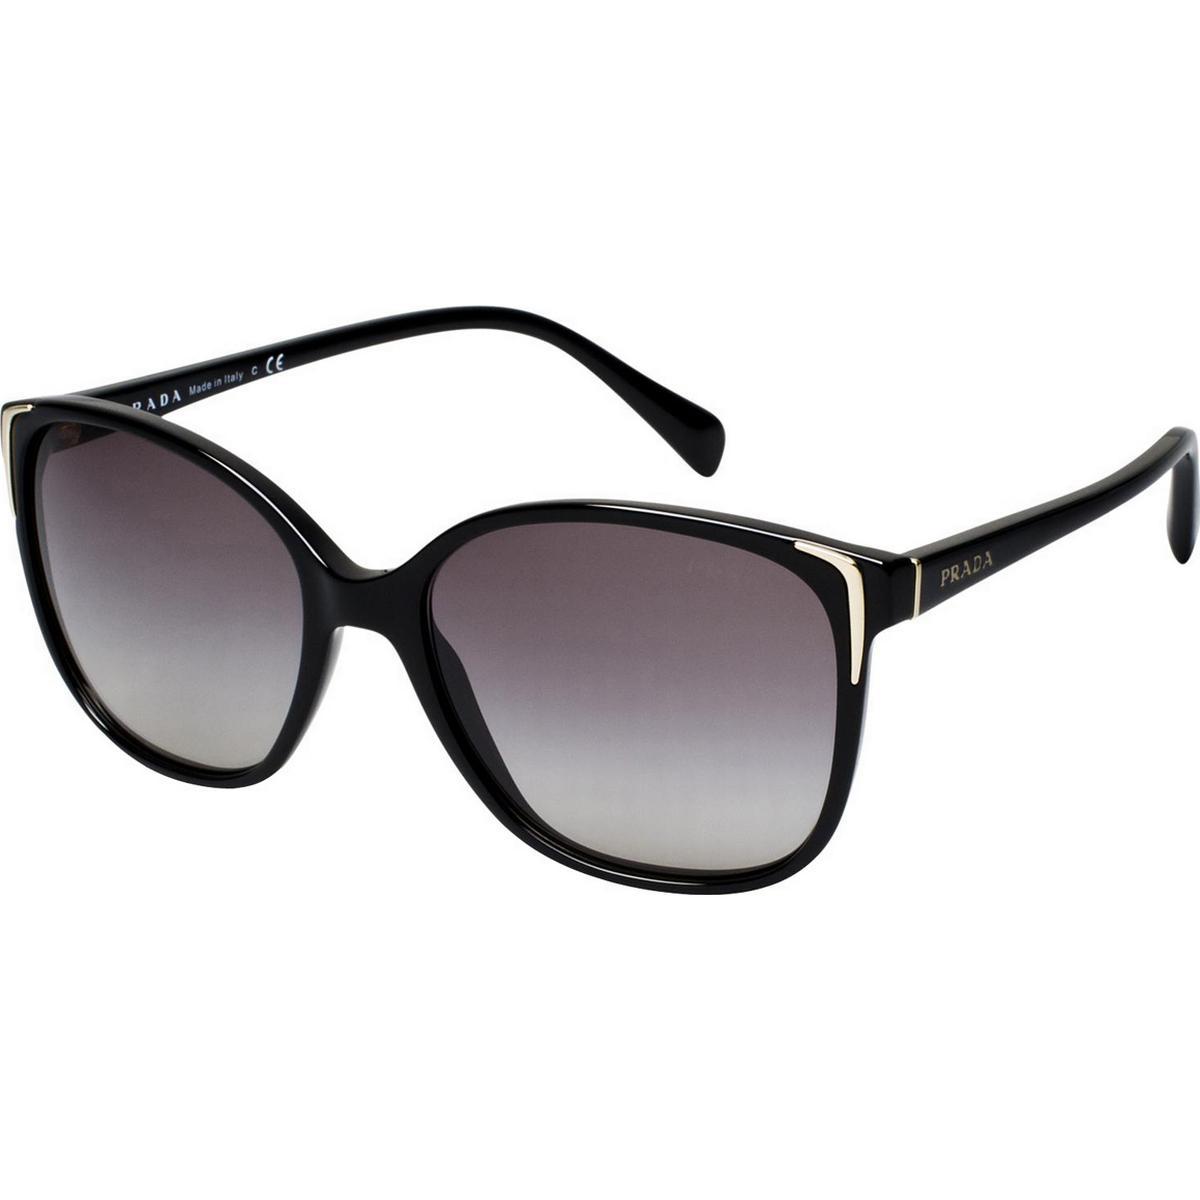 255ac53ce80b Prada Solbriller - Sammenlign priser hos PriceRunner